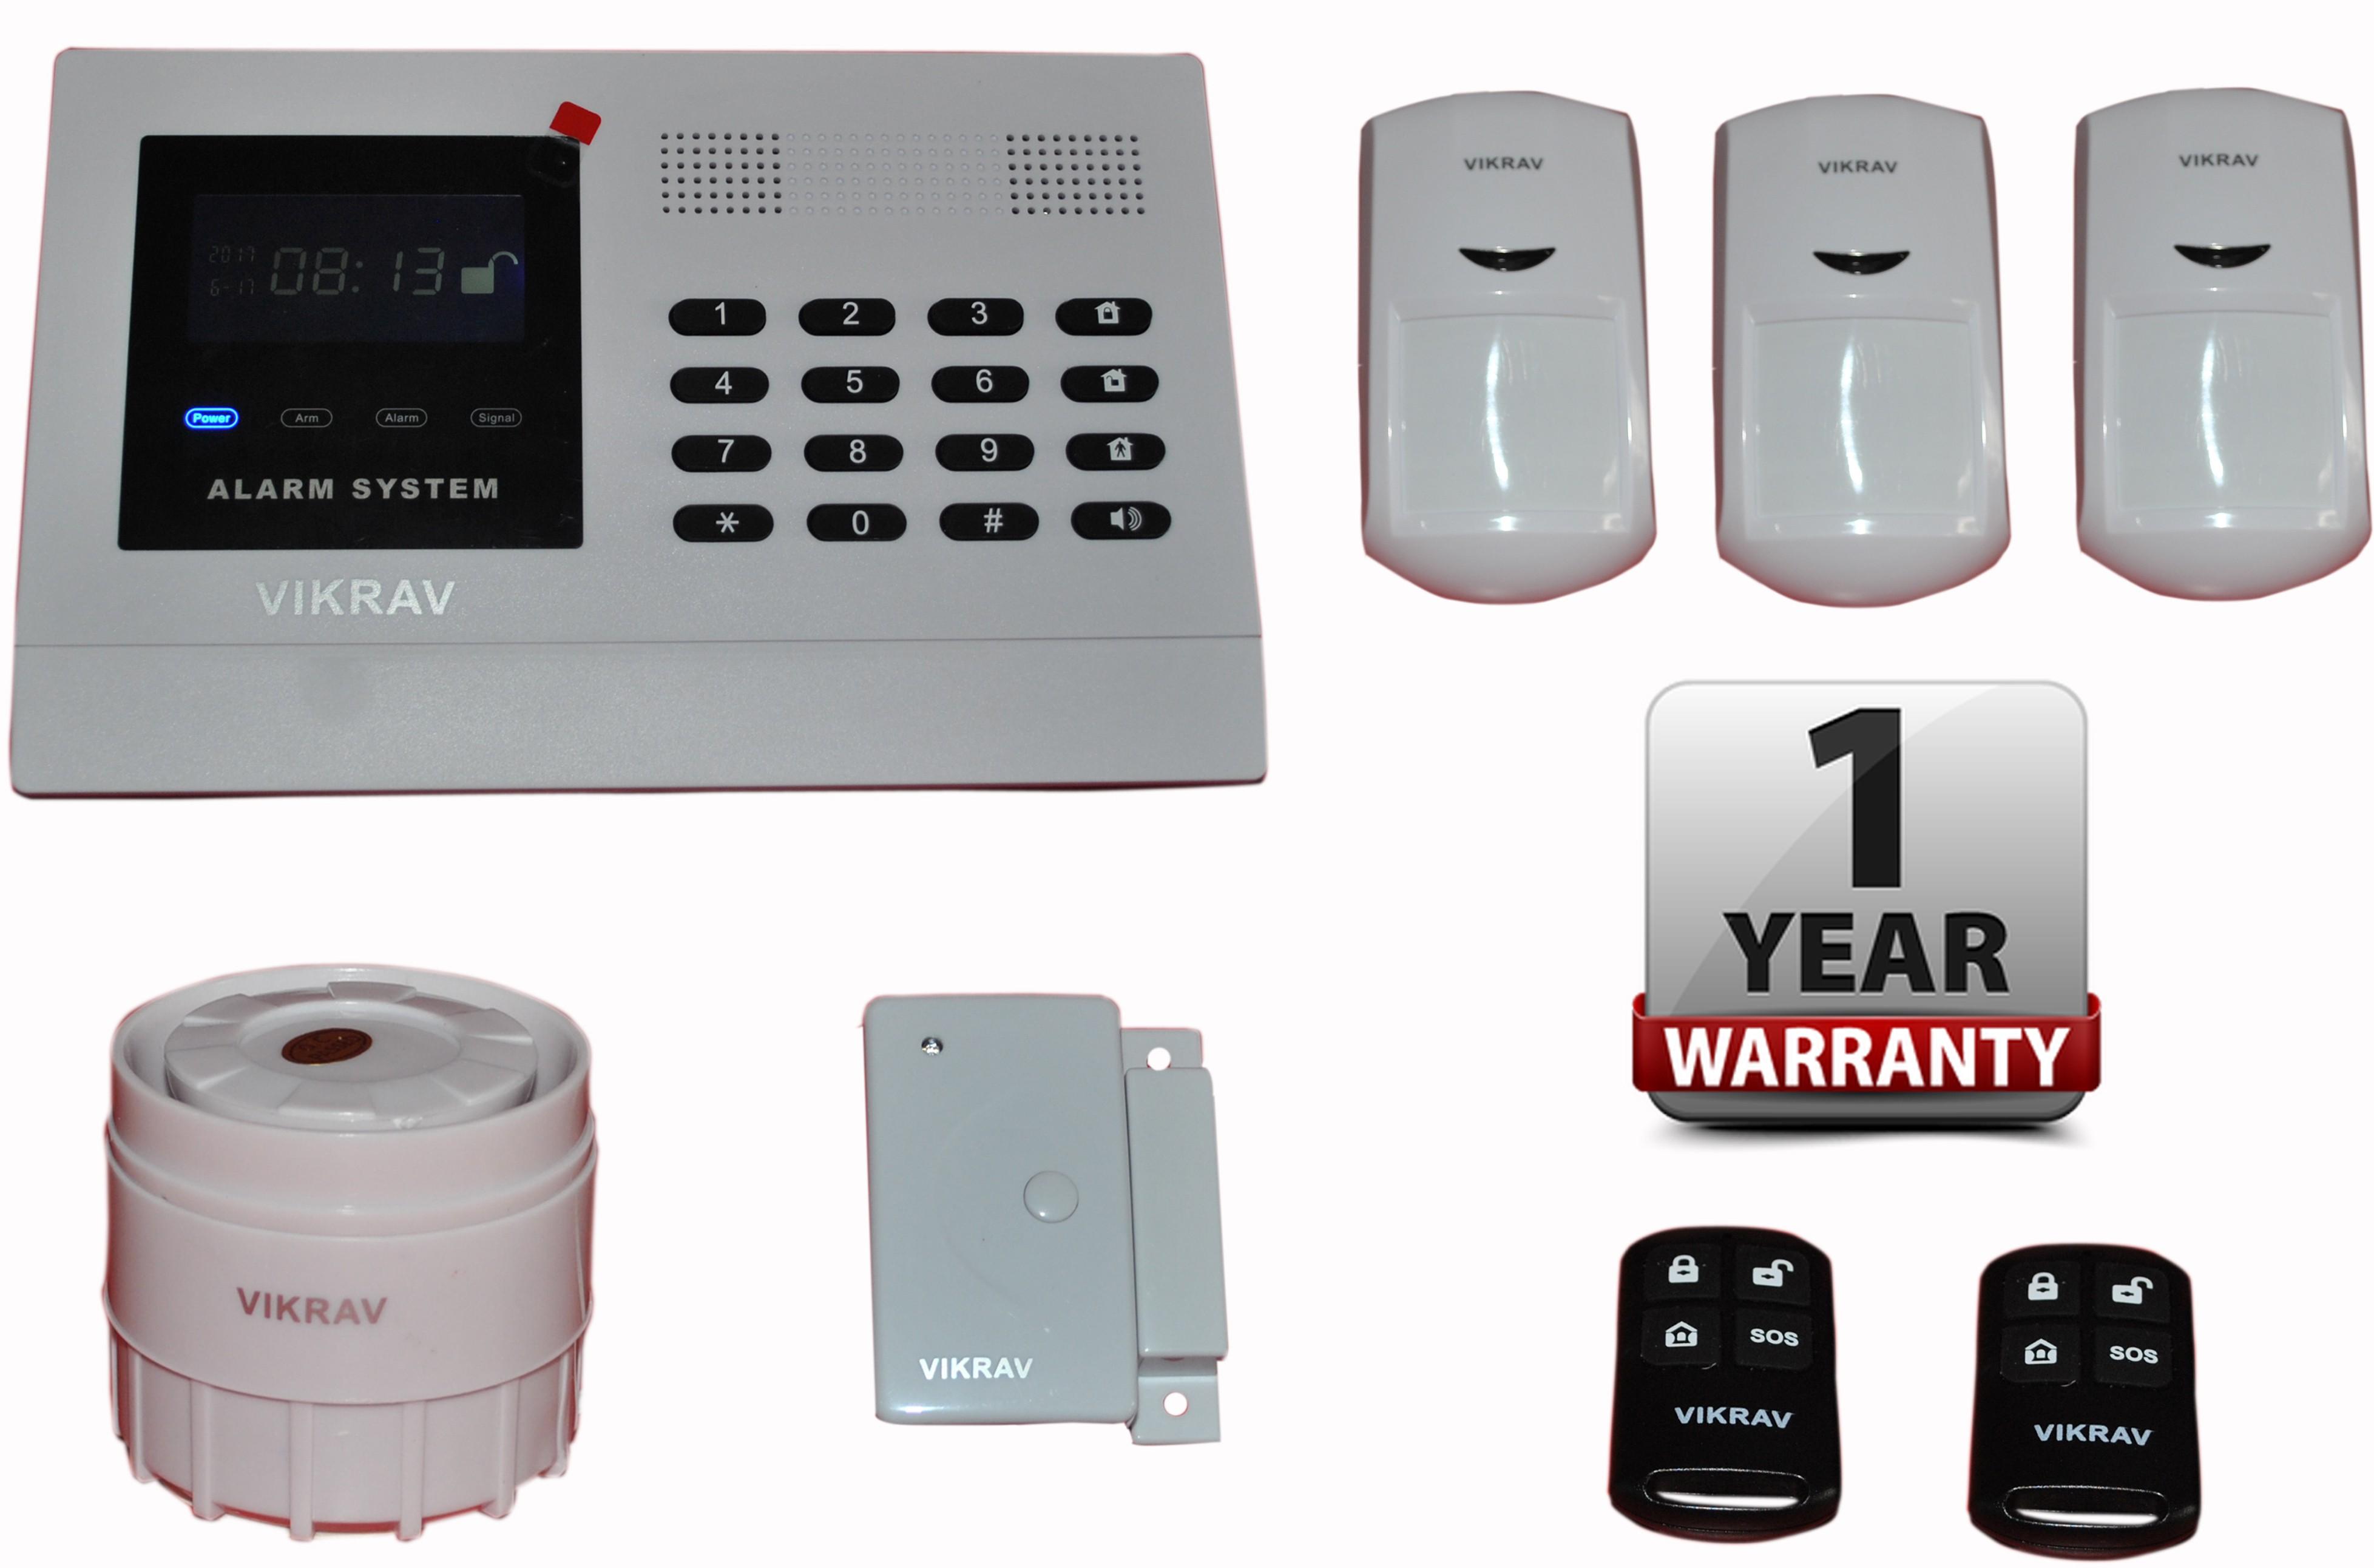 View vikrav VJ-101 Wireless Sensor Security System Home Appliances Price Online(vikrav)